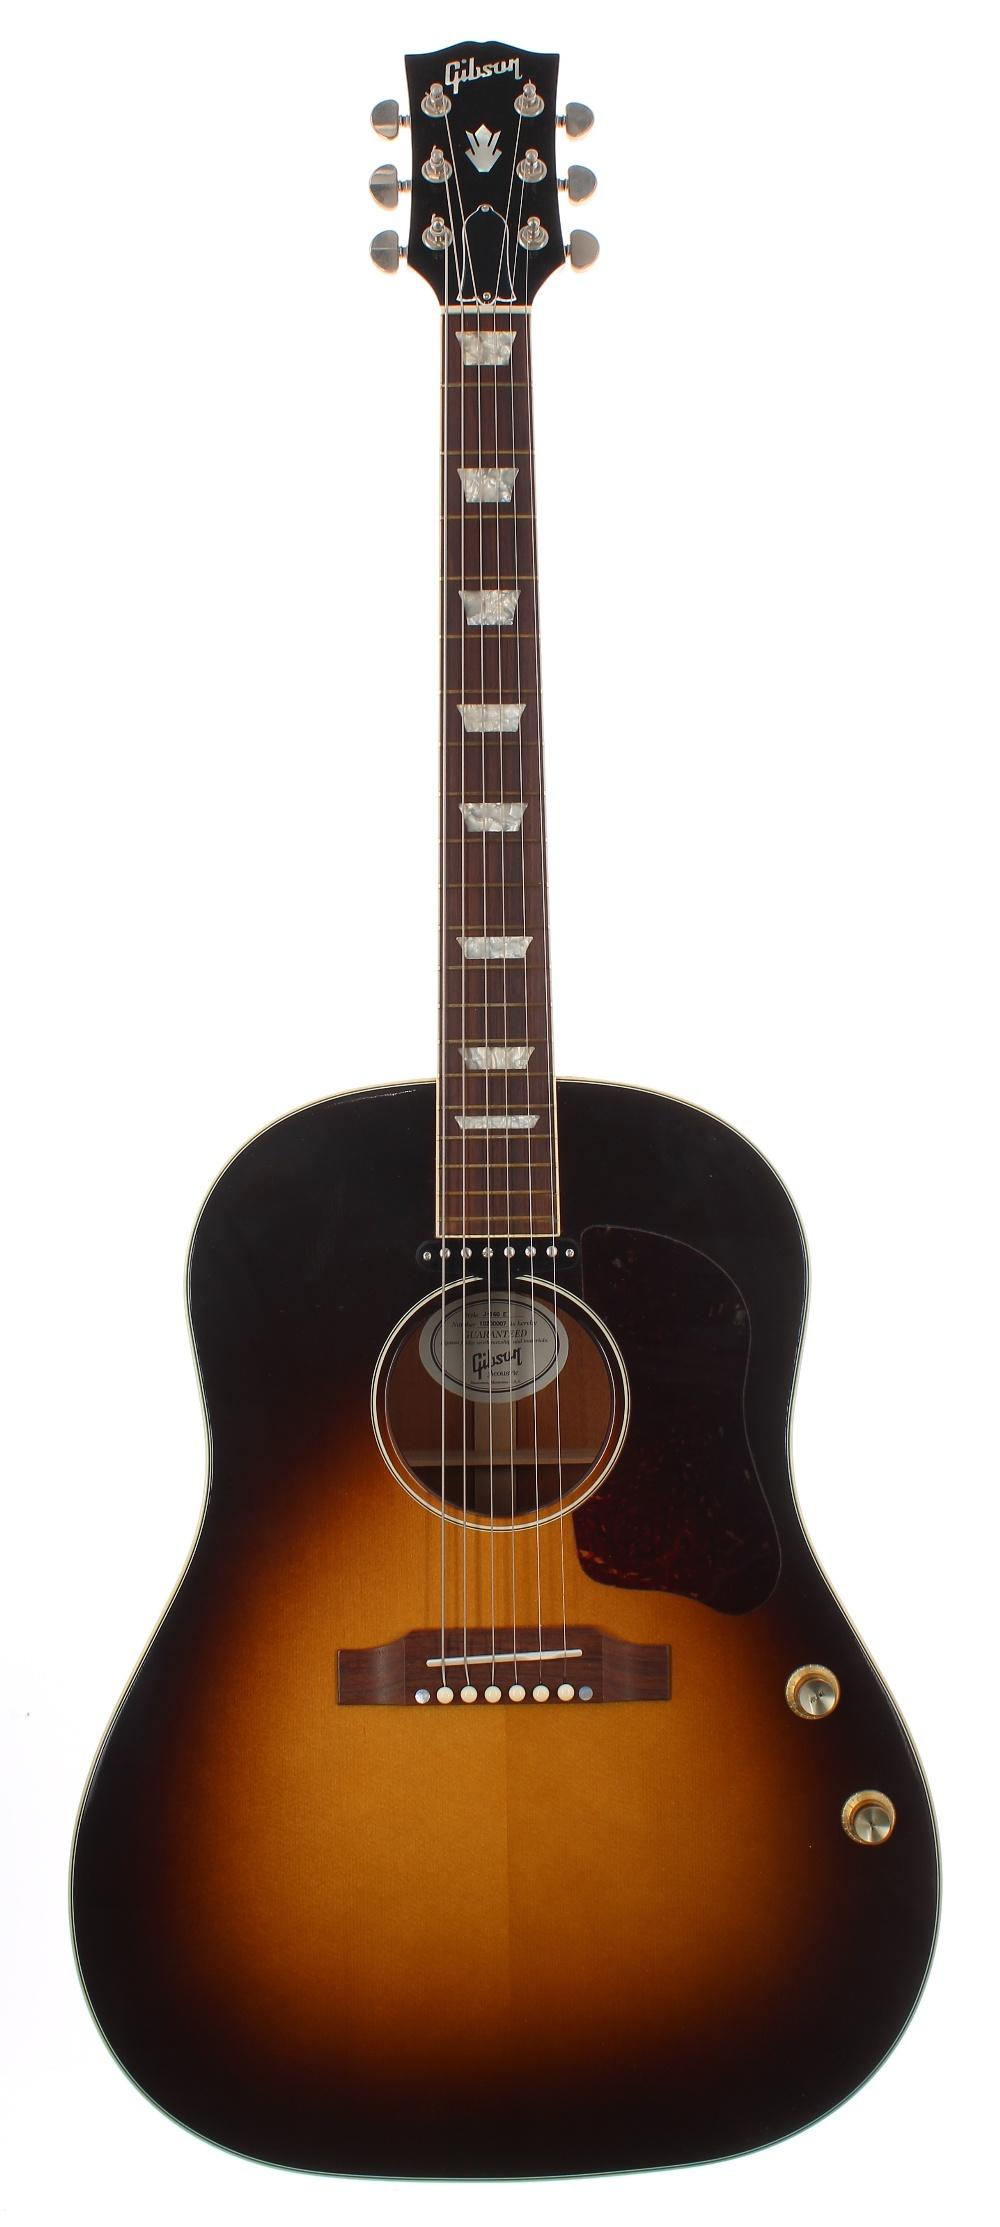 2010 Gibson J-160E electro-acoustic guitar, made in USA, ser. no. 1xxx0xx7; Finish: vintage